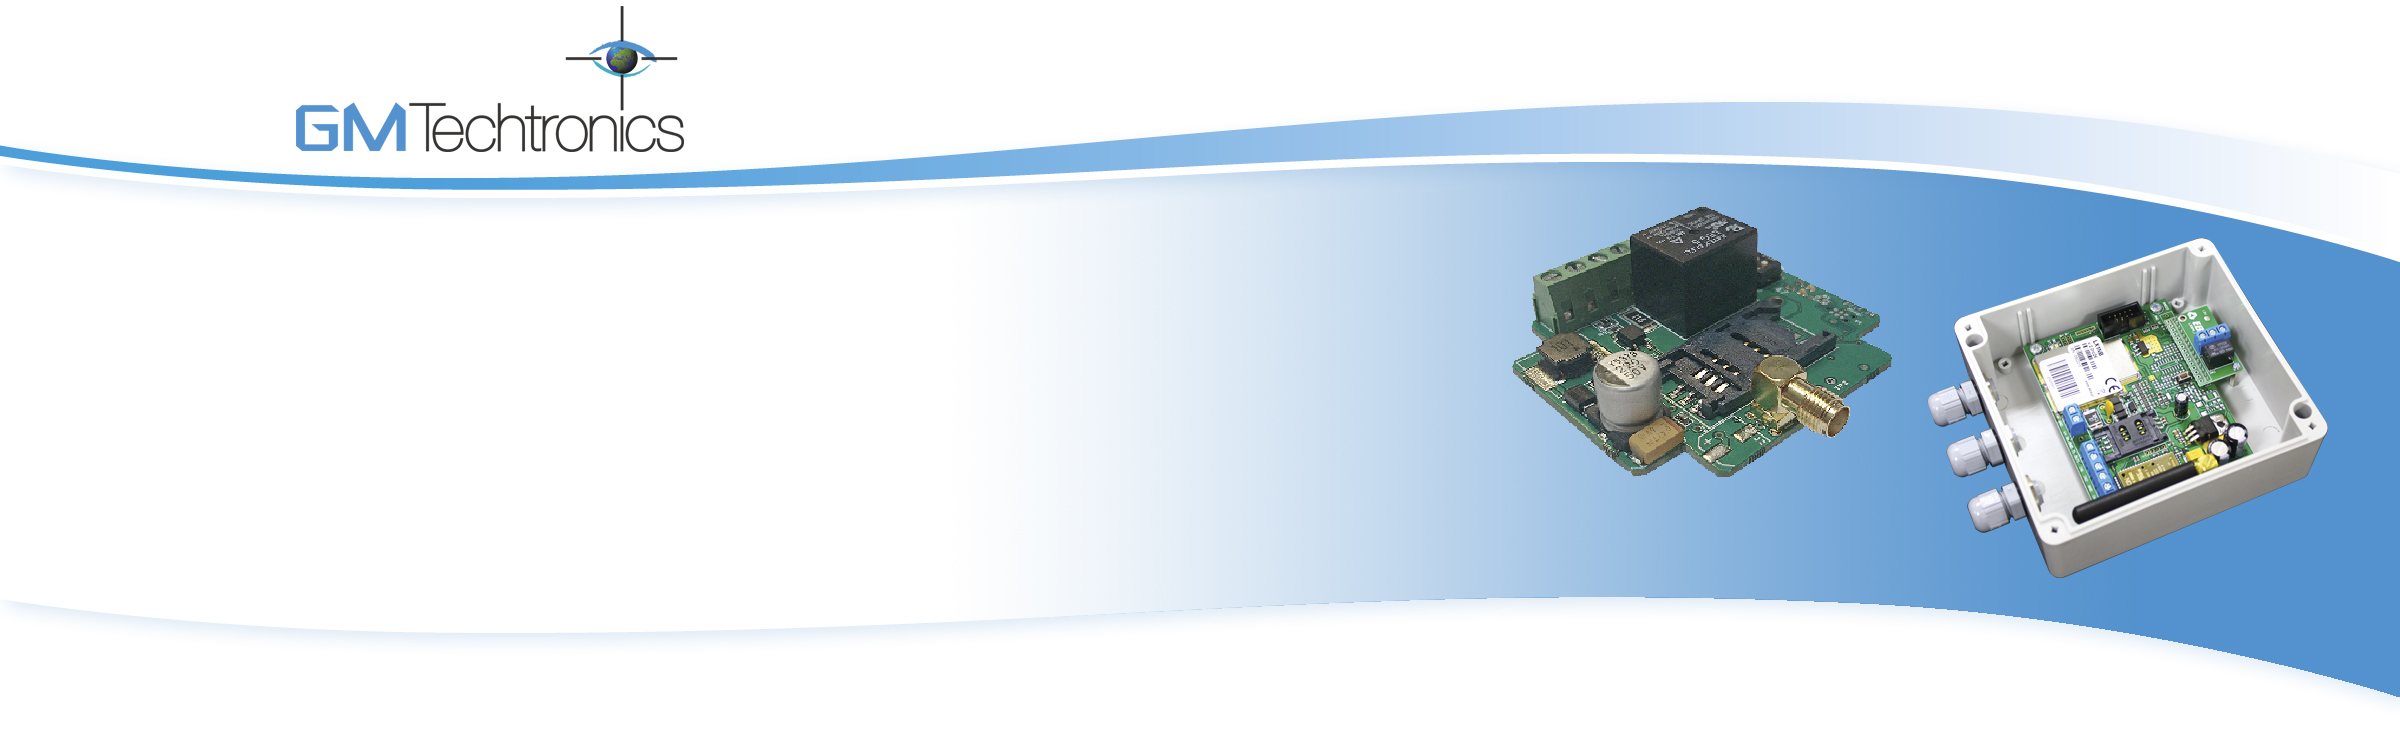 GM-Tech-slides-RC11